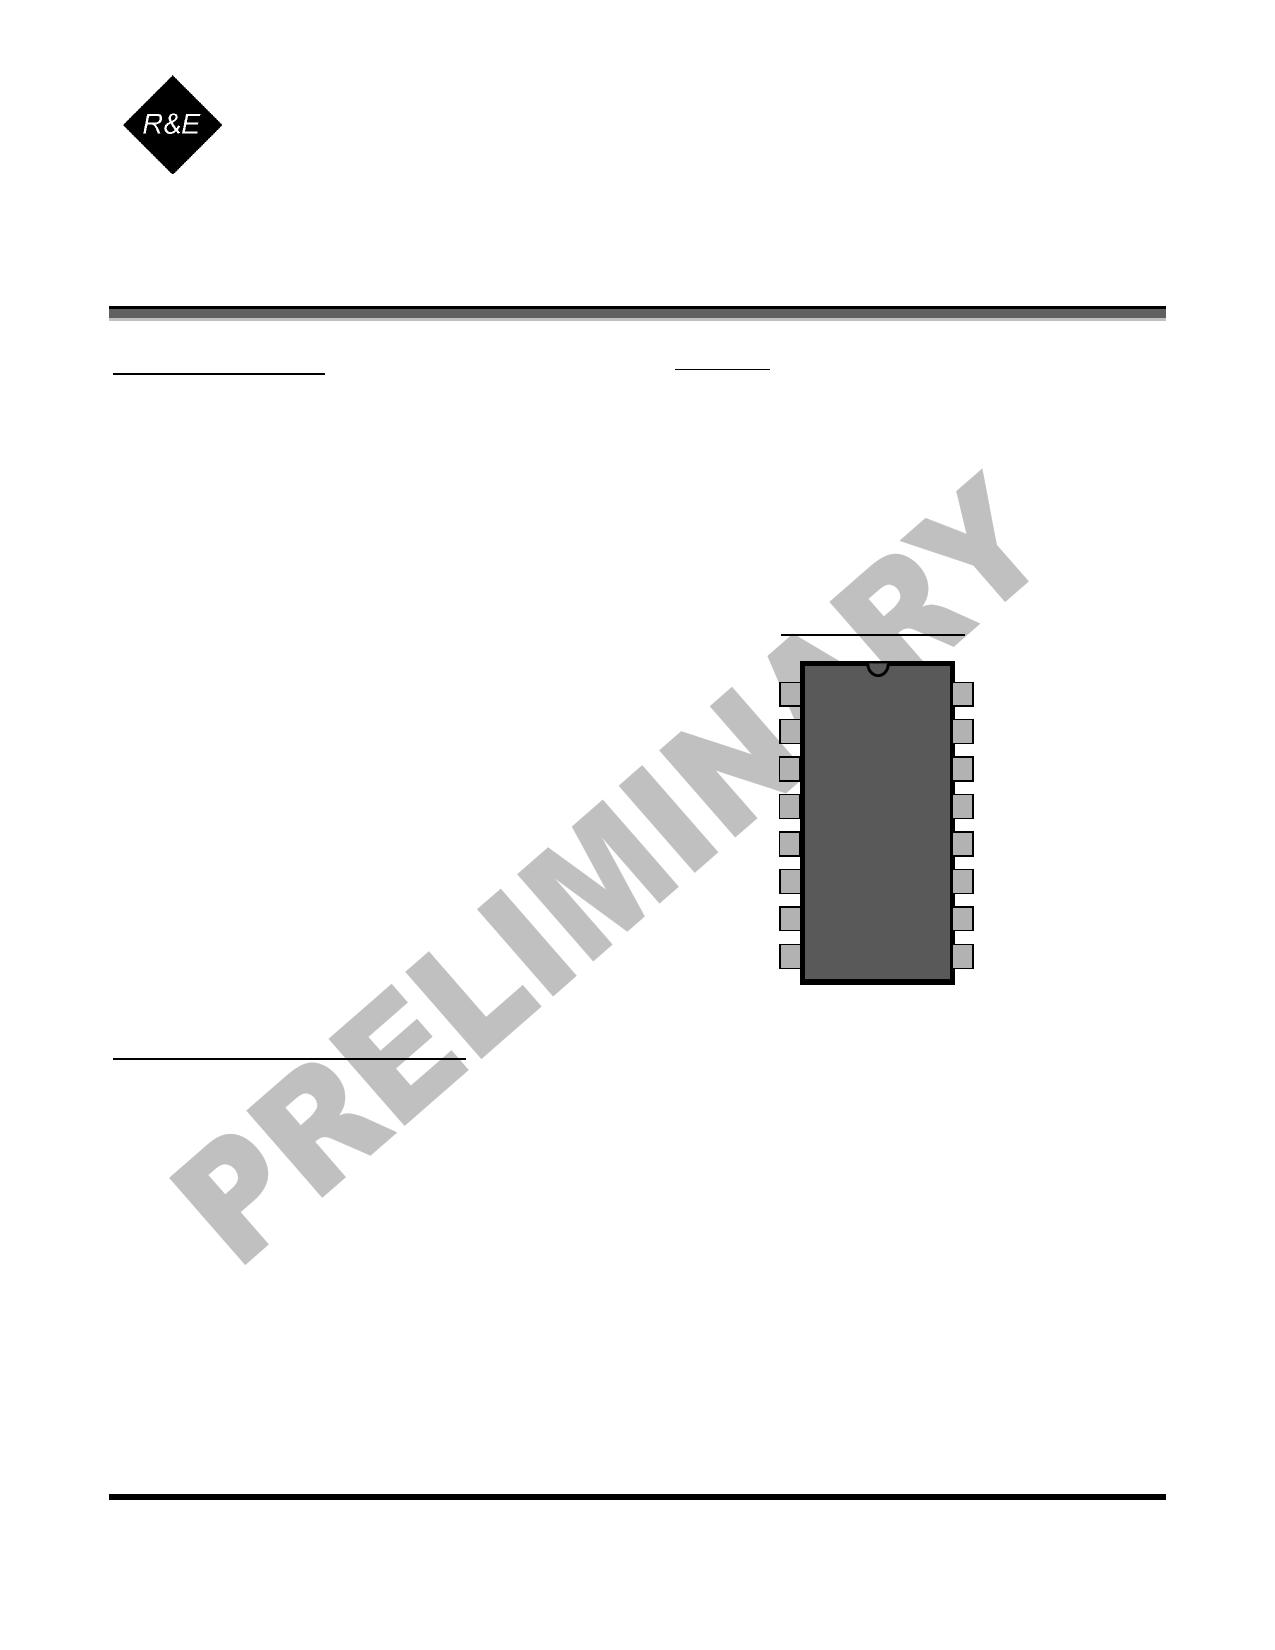 re46c160  u30c7 u30fc u30bf u30b7 u30fc u30c8 pdf